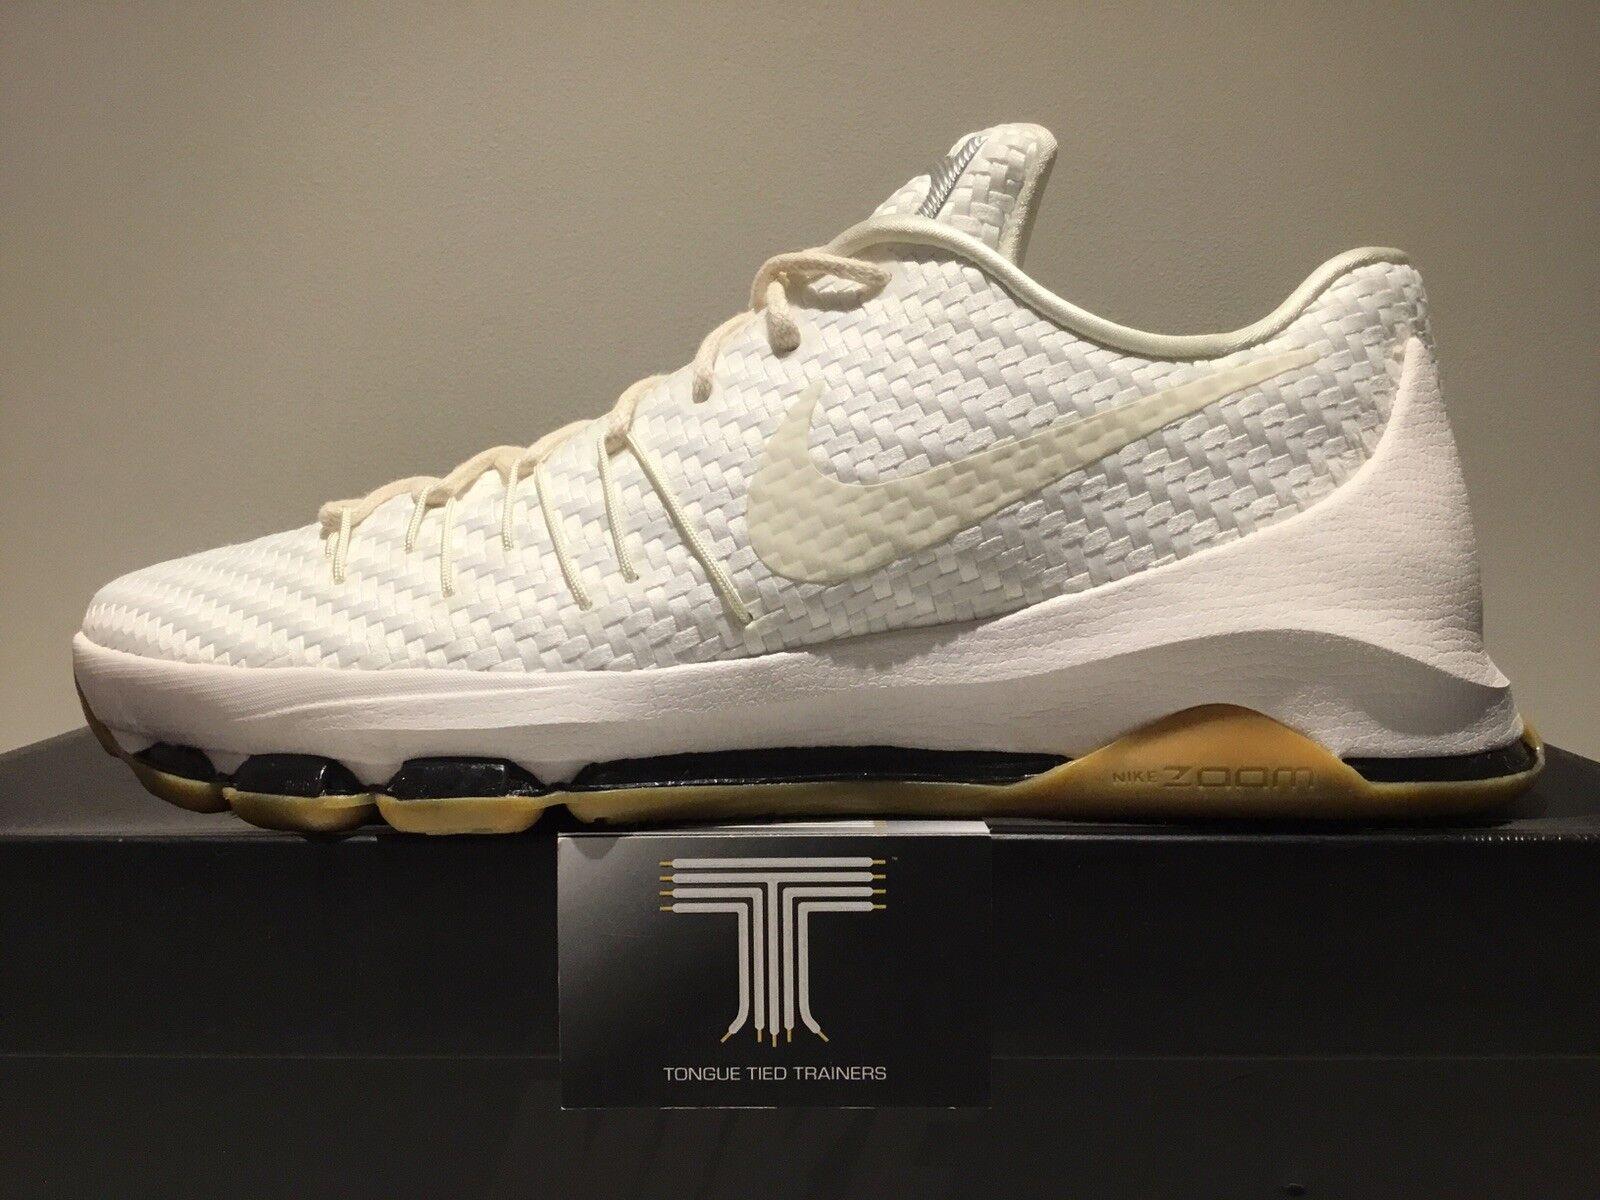 Nike femme huarache Imprimer 400 Running Baskets 725076 400 Imprimer Baskets Chaussures De DégageHommes t 6ad6a0